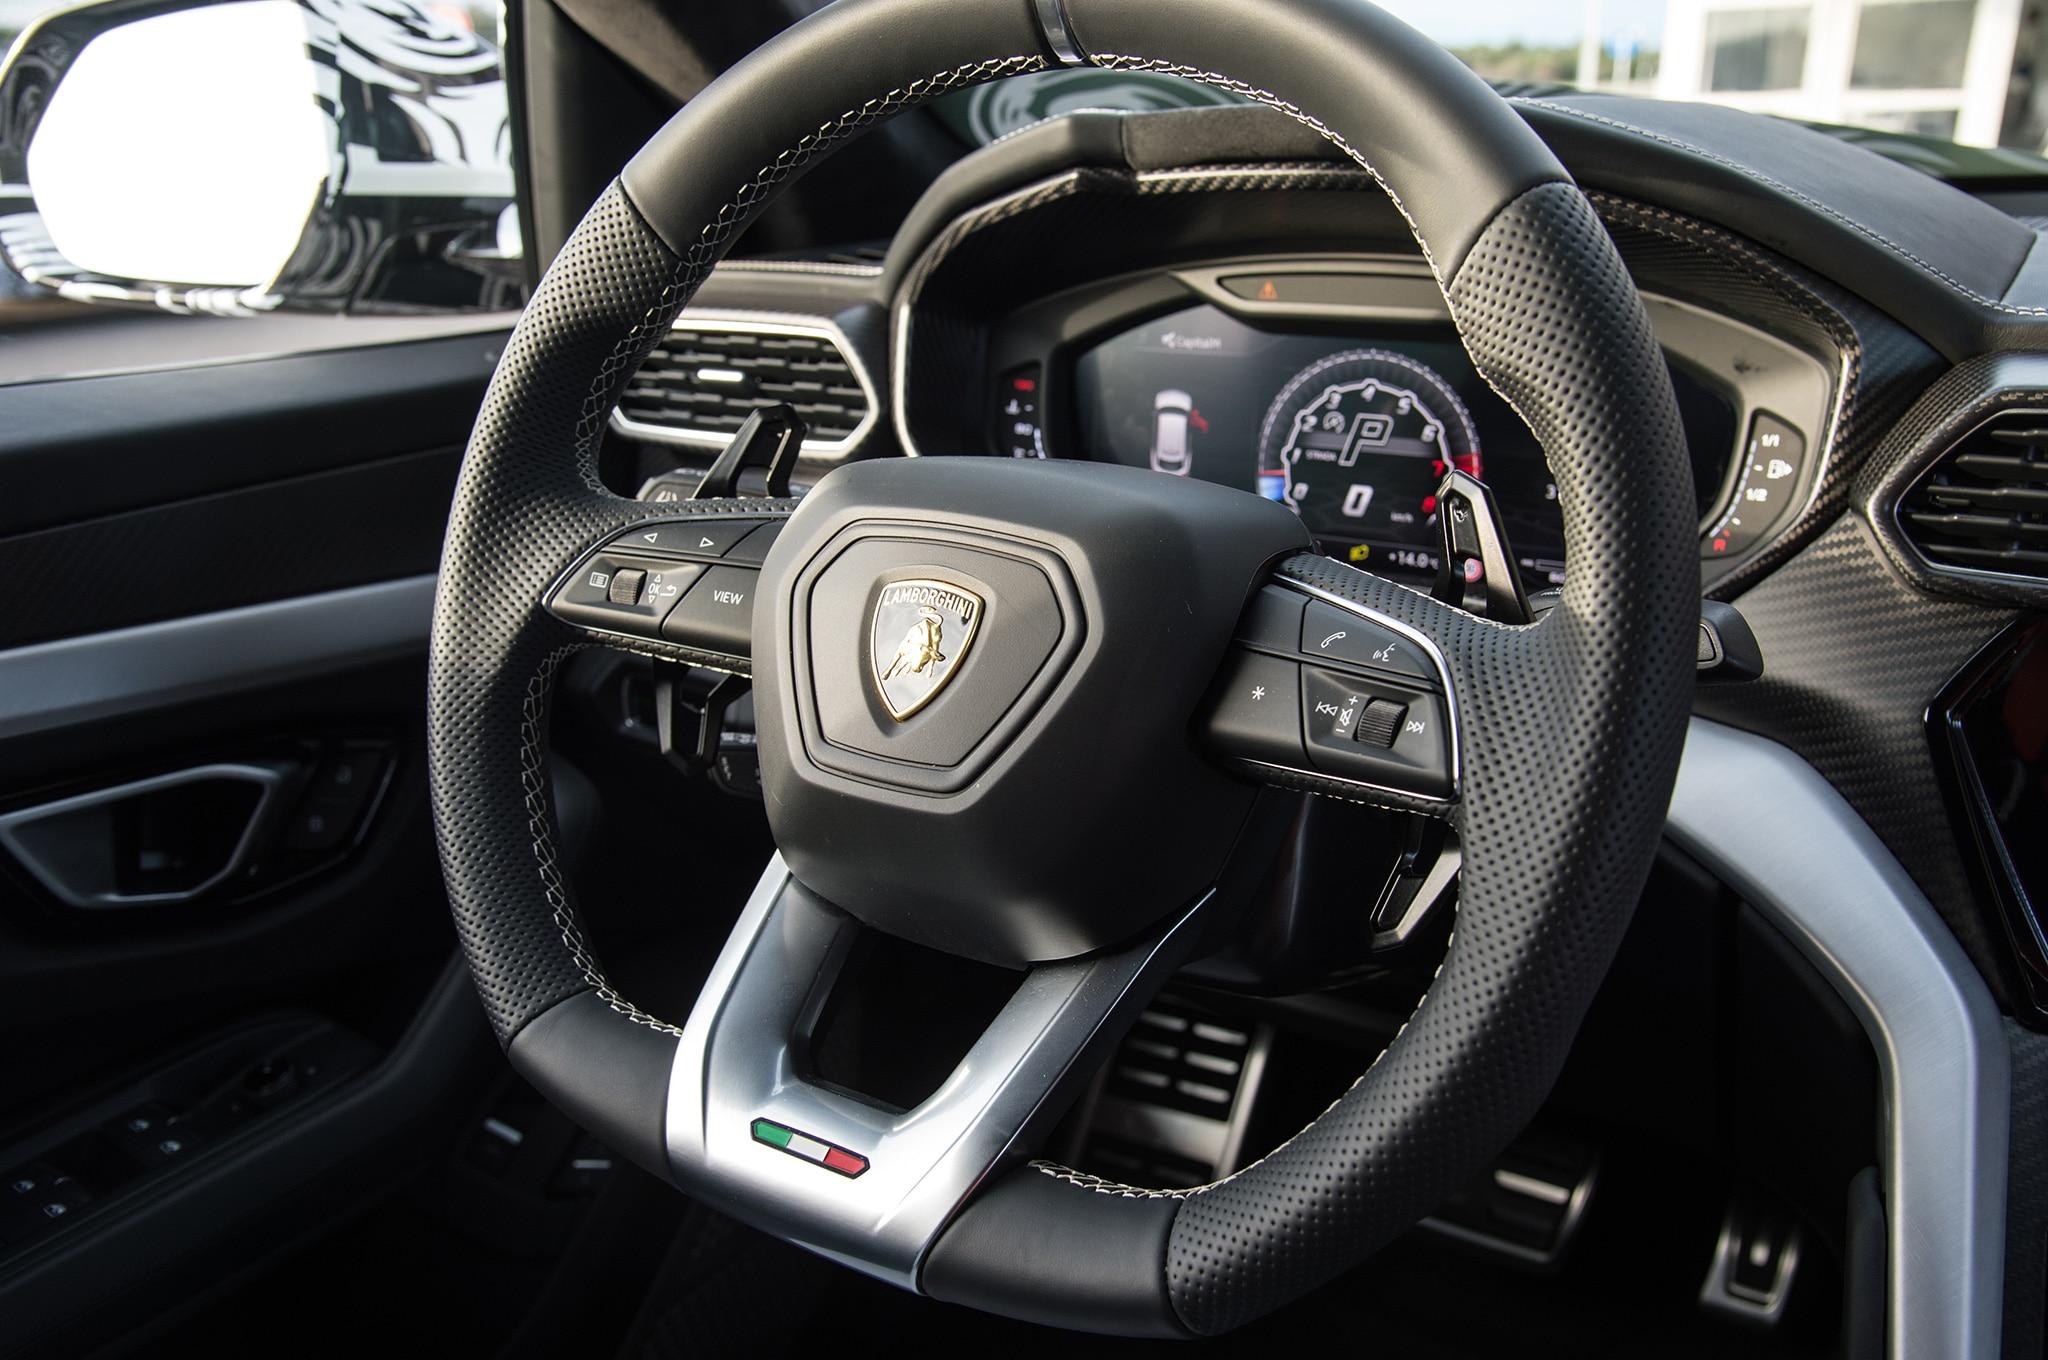 2019-Lamborghini-Urus-interior-steering-wheel.jpg